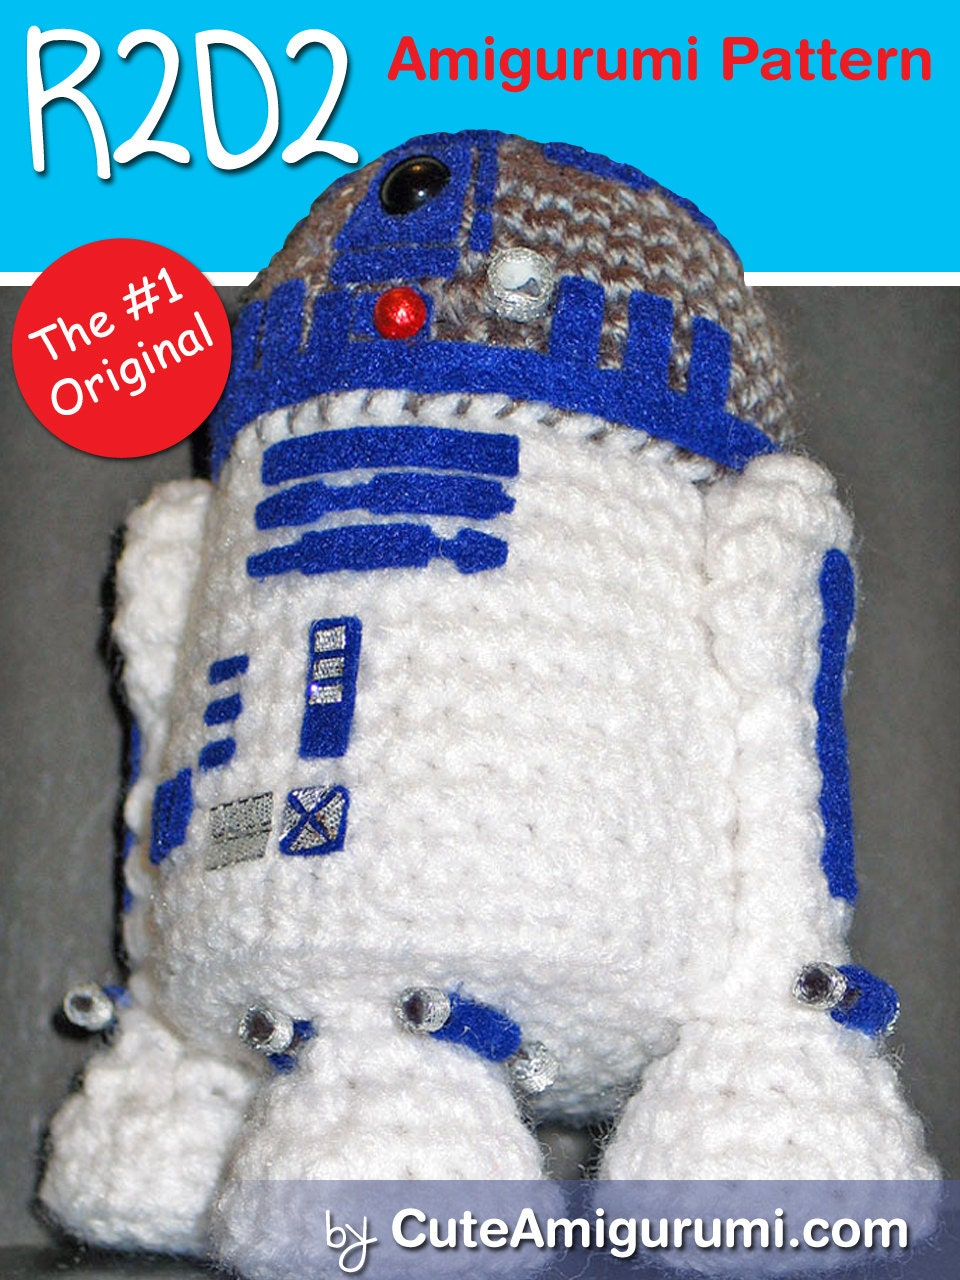 Death Star Amigurumi Pattern : Star Wars R2D2 Amigurumi Pattern by janama on Etsy